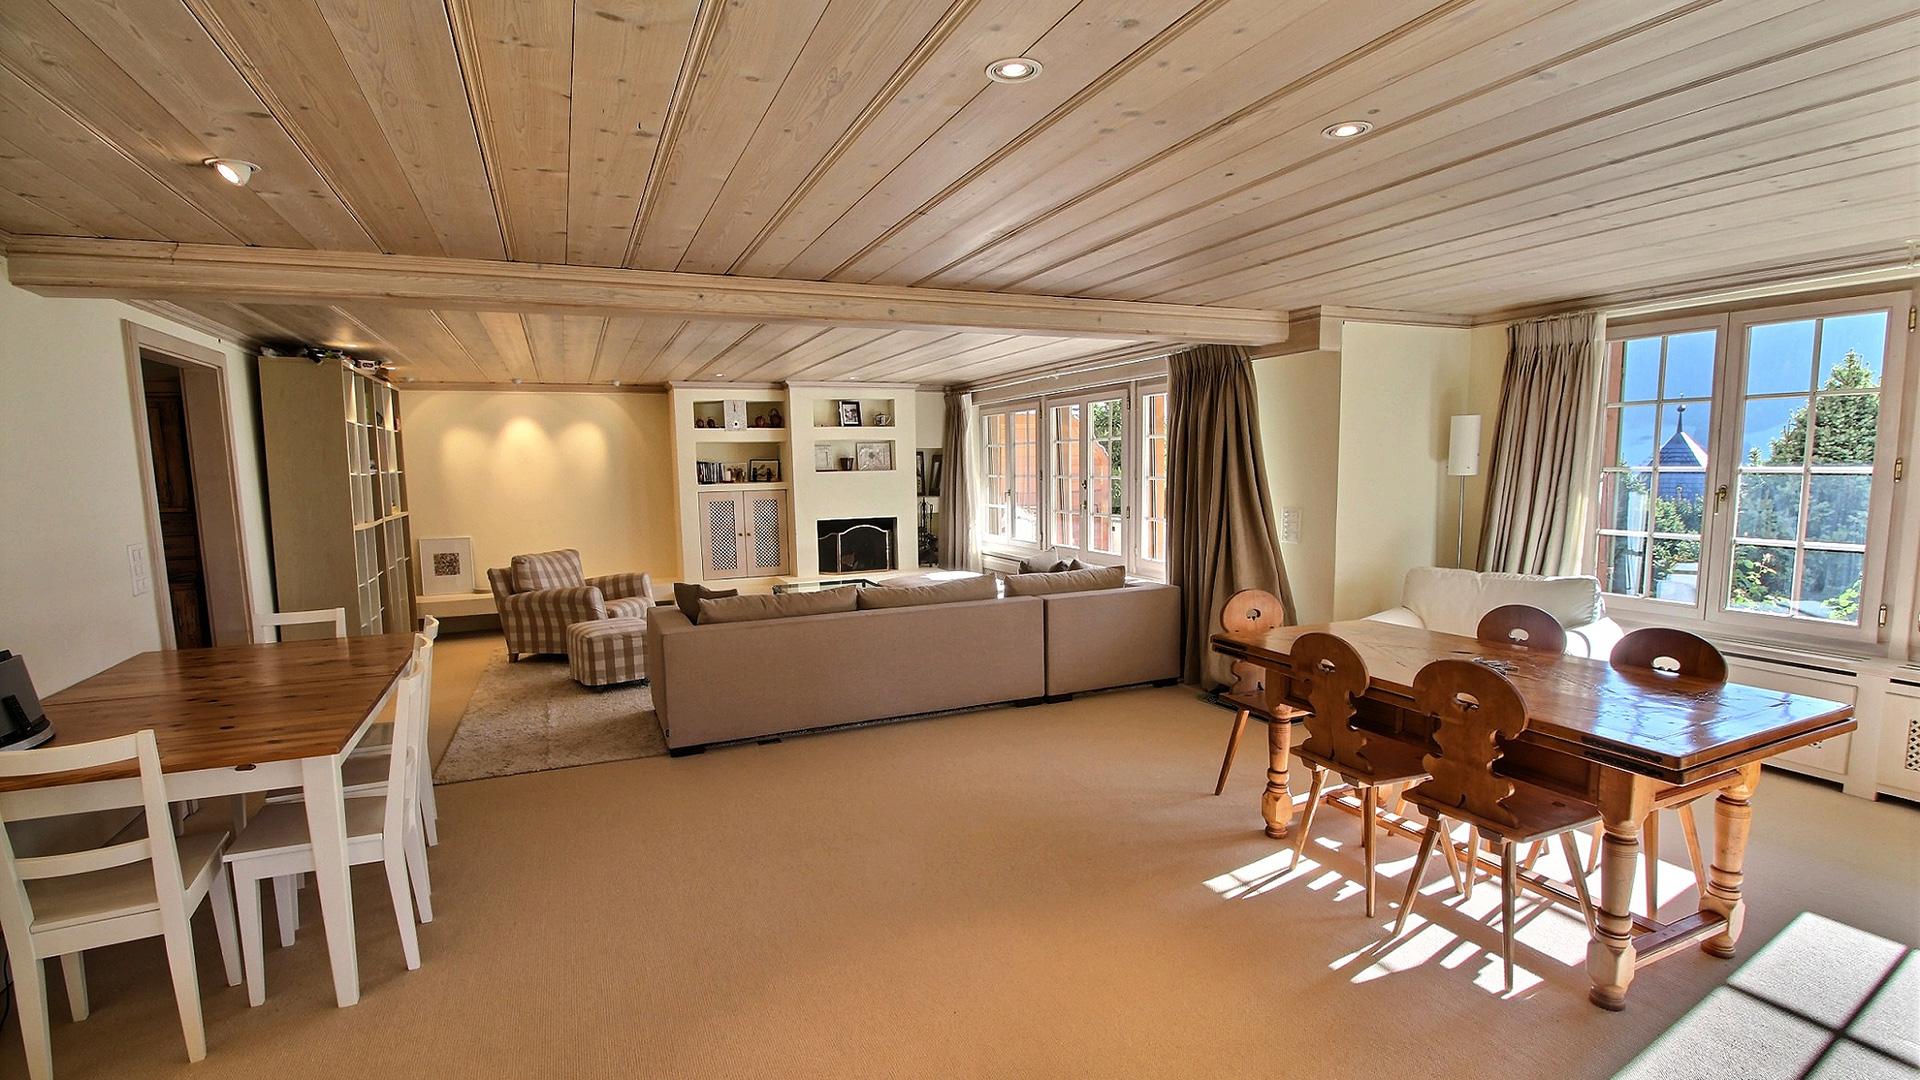 Foret Verte Apartments, Switzerland